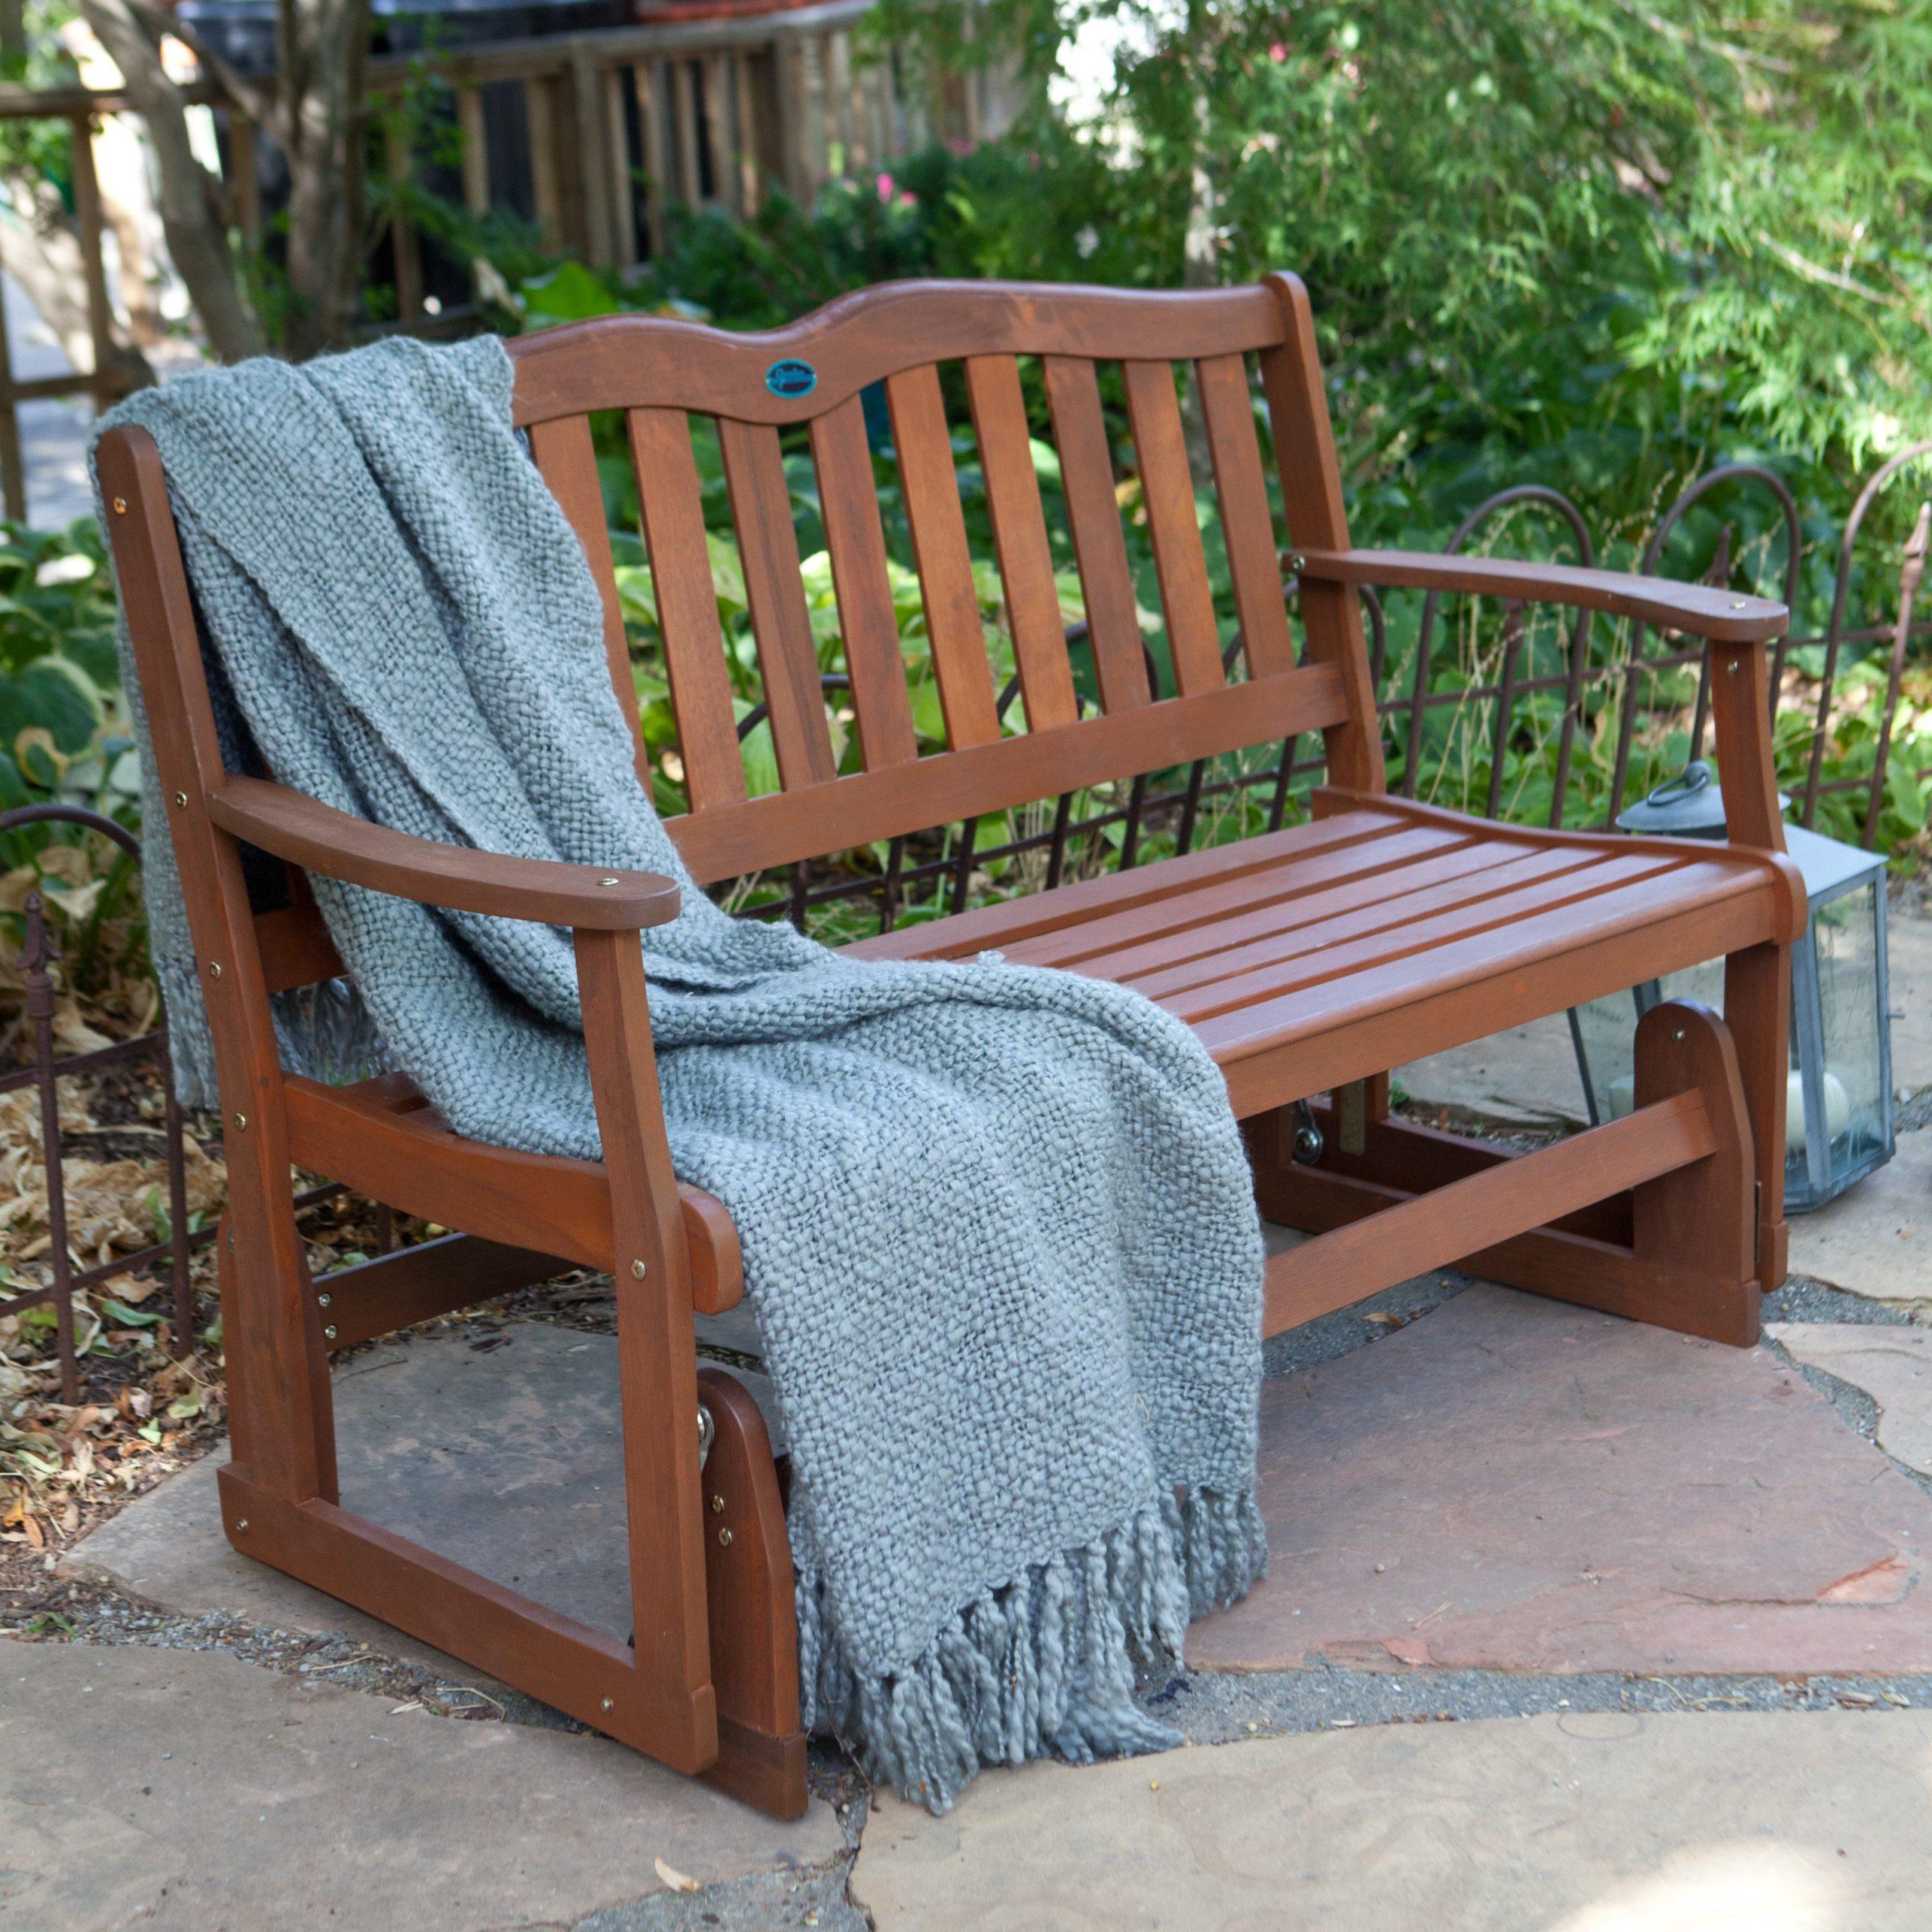 Bench Furniture Patio Front Porch Manufacturing Alpine Regarding Loveseat Glider Benches (View 17 of 25)